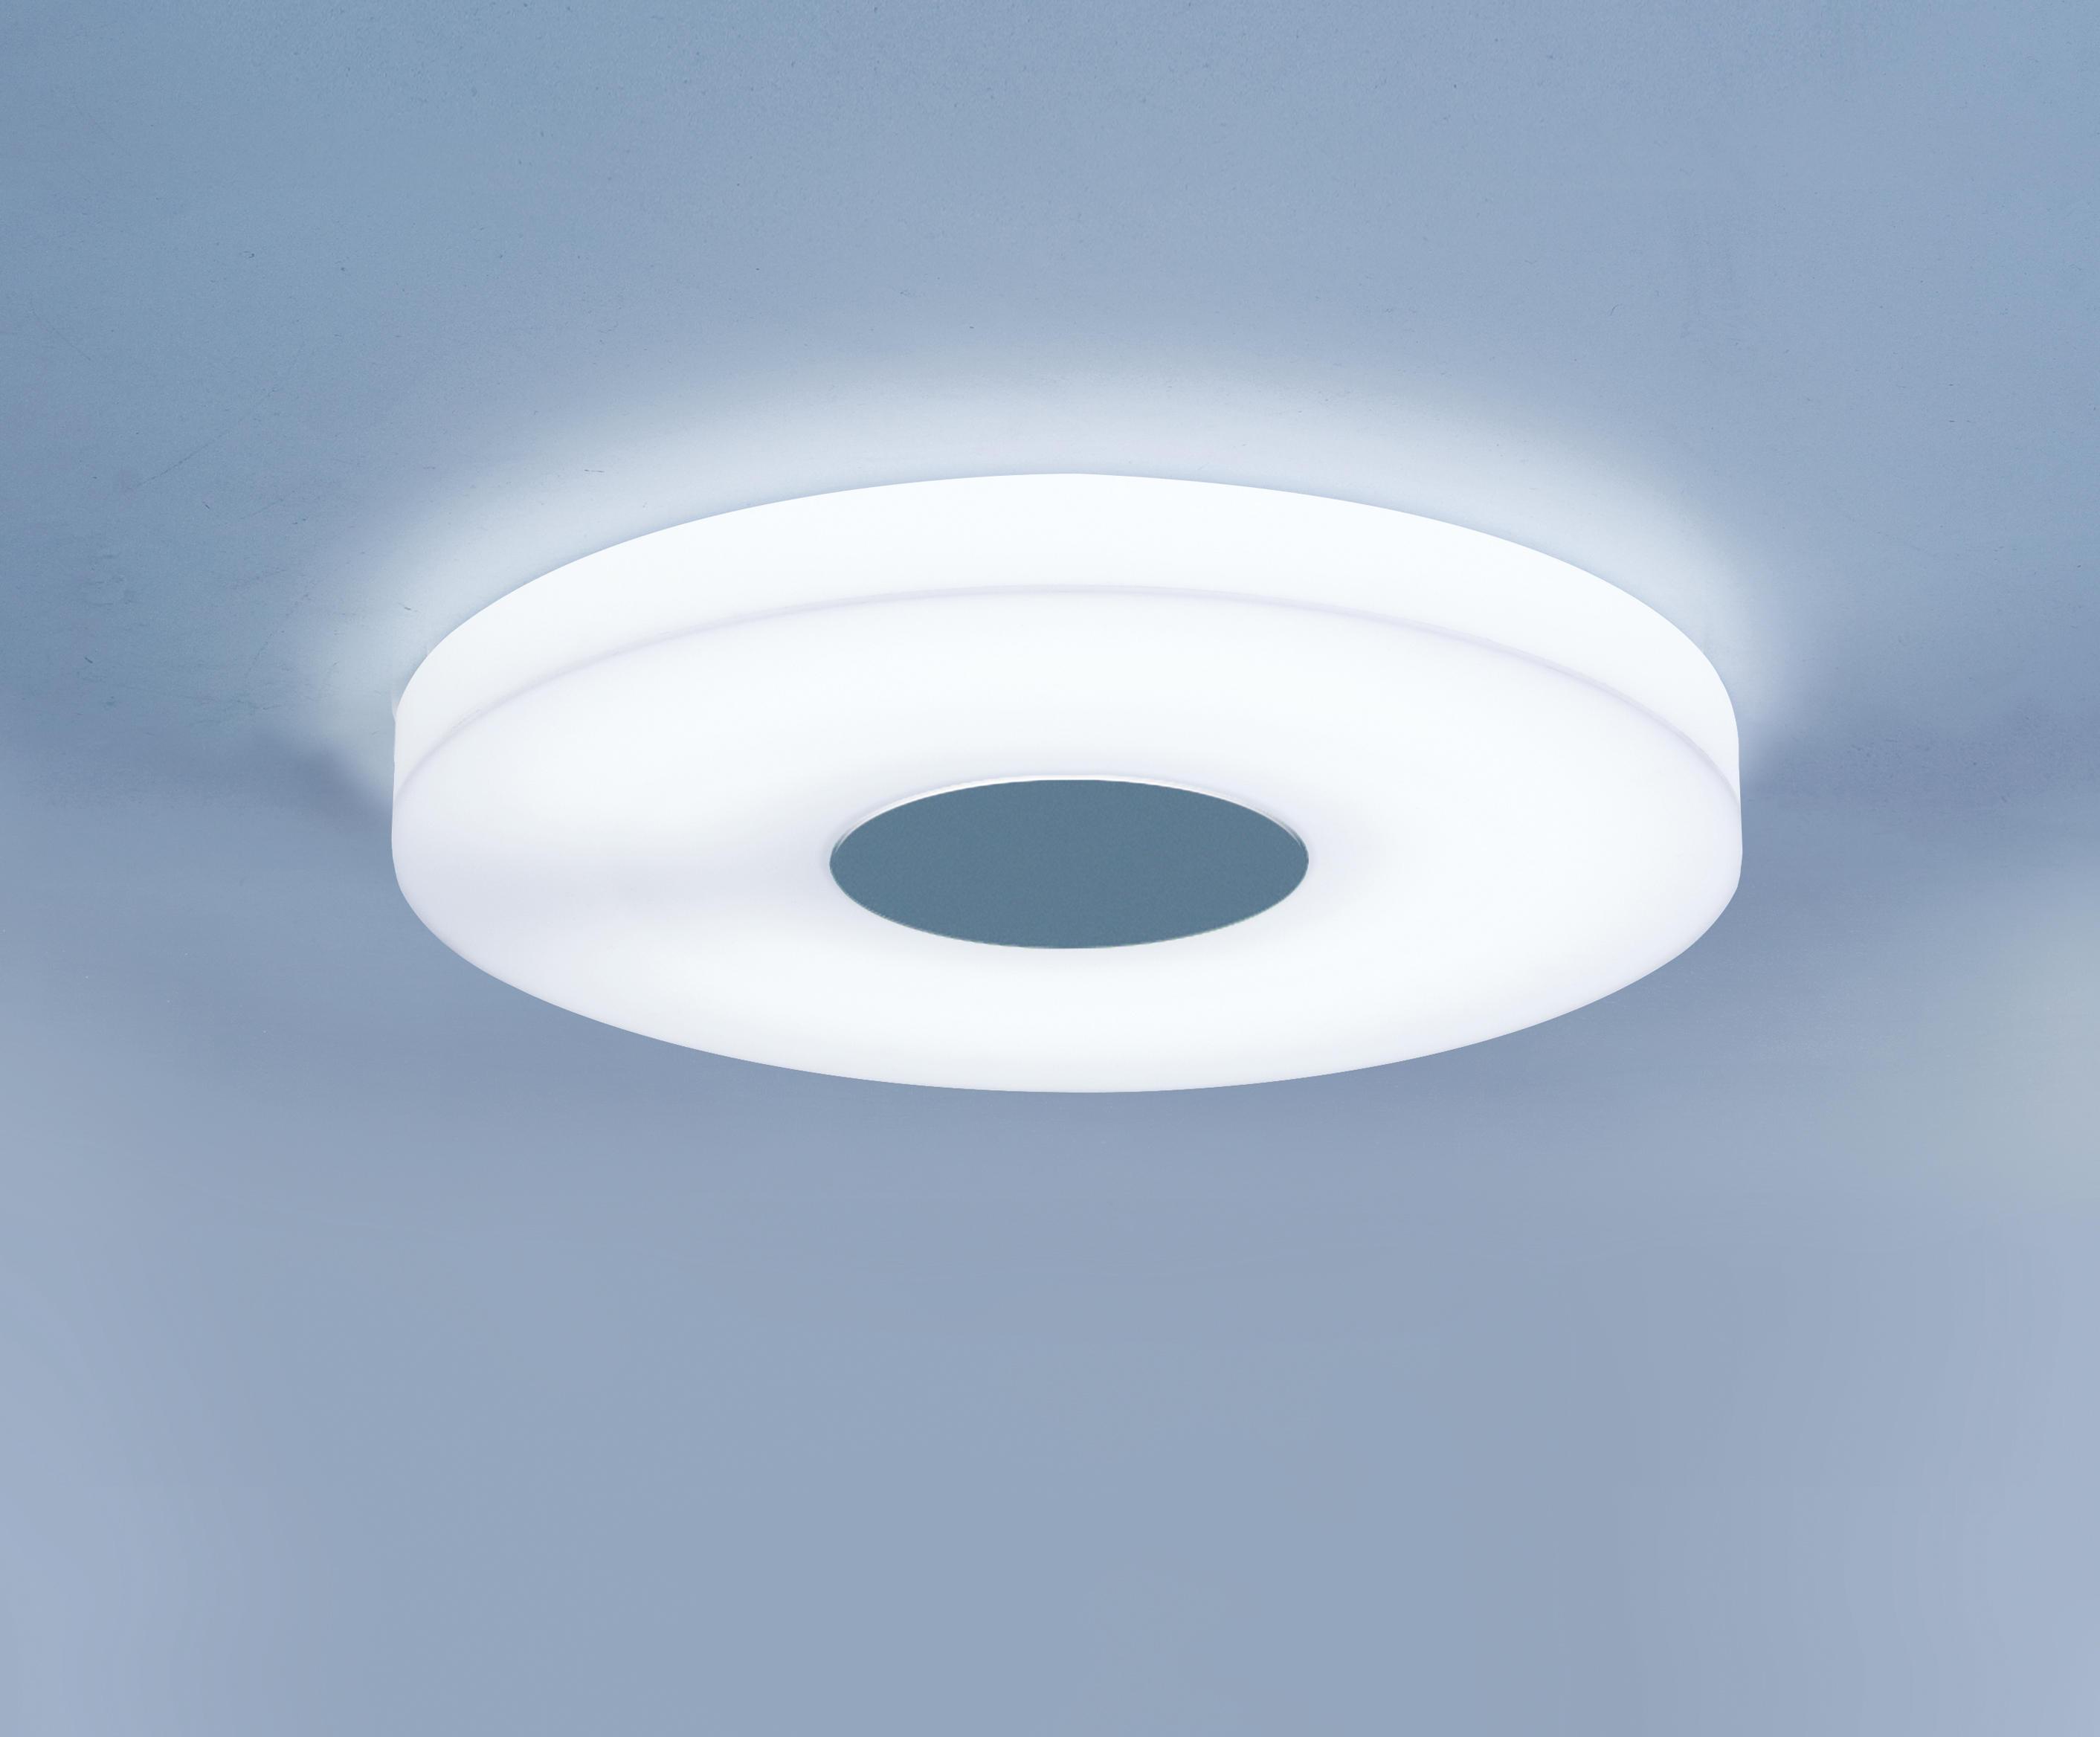 Plafoniere Foscarini : Wax a1 lampade plafoniere lightnet architonic